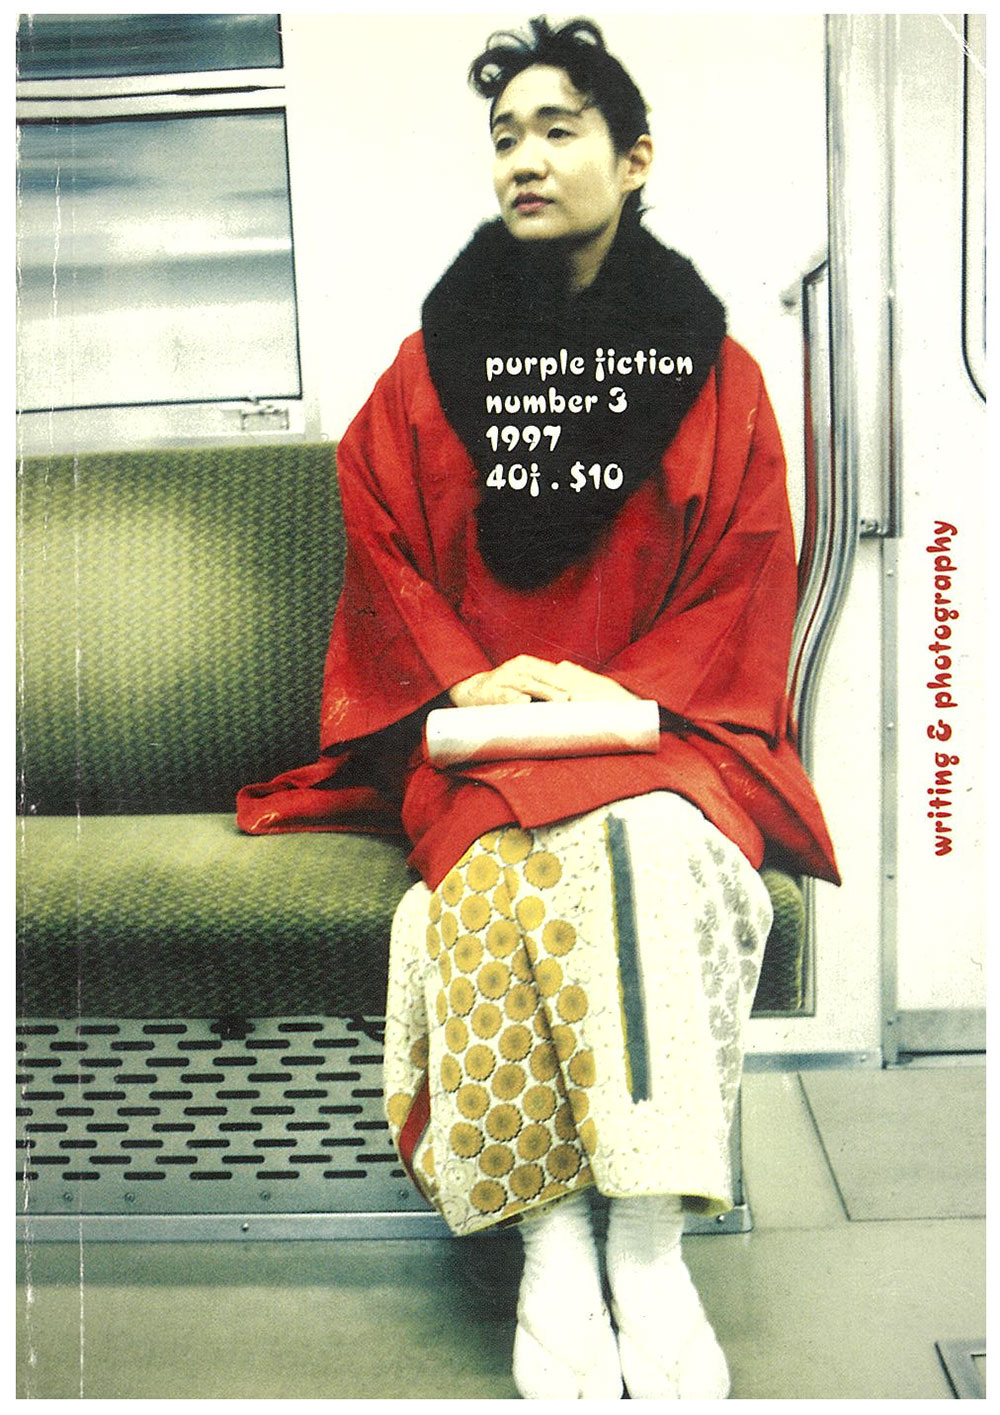 『purple fiction #3』/1997年   Photo by Chikashi Suzuki